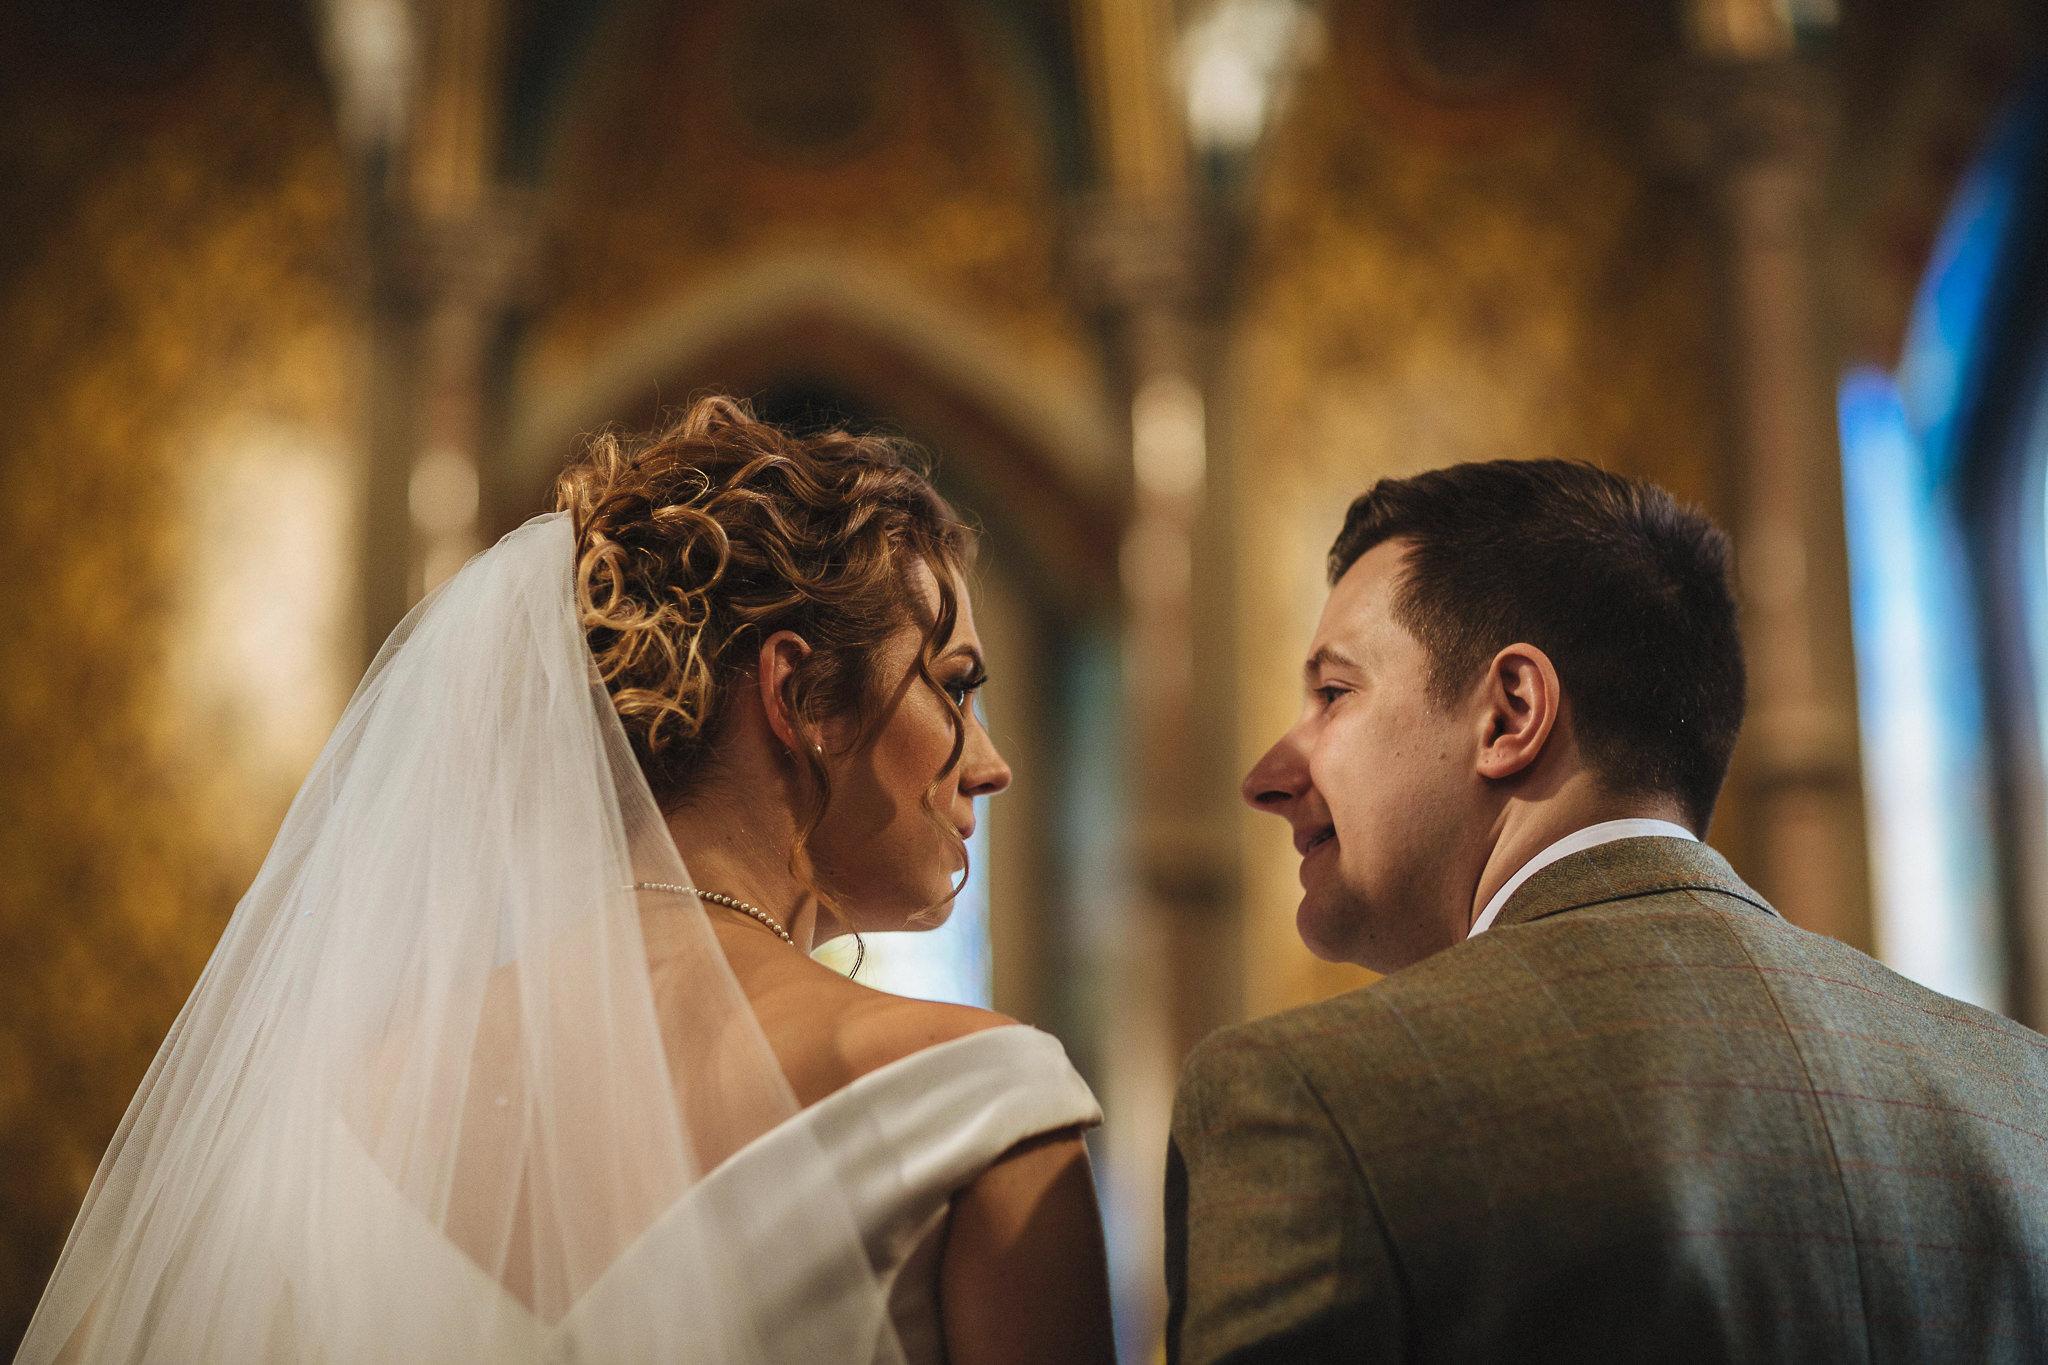 Lancashire-Creative-natural-documentary-wedding-photography-90042